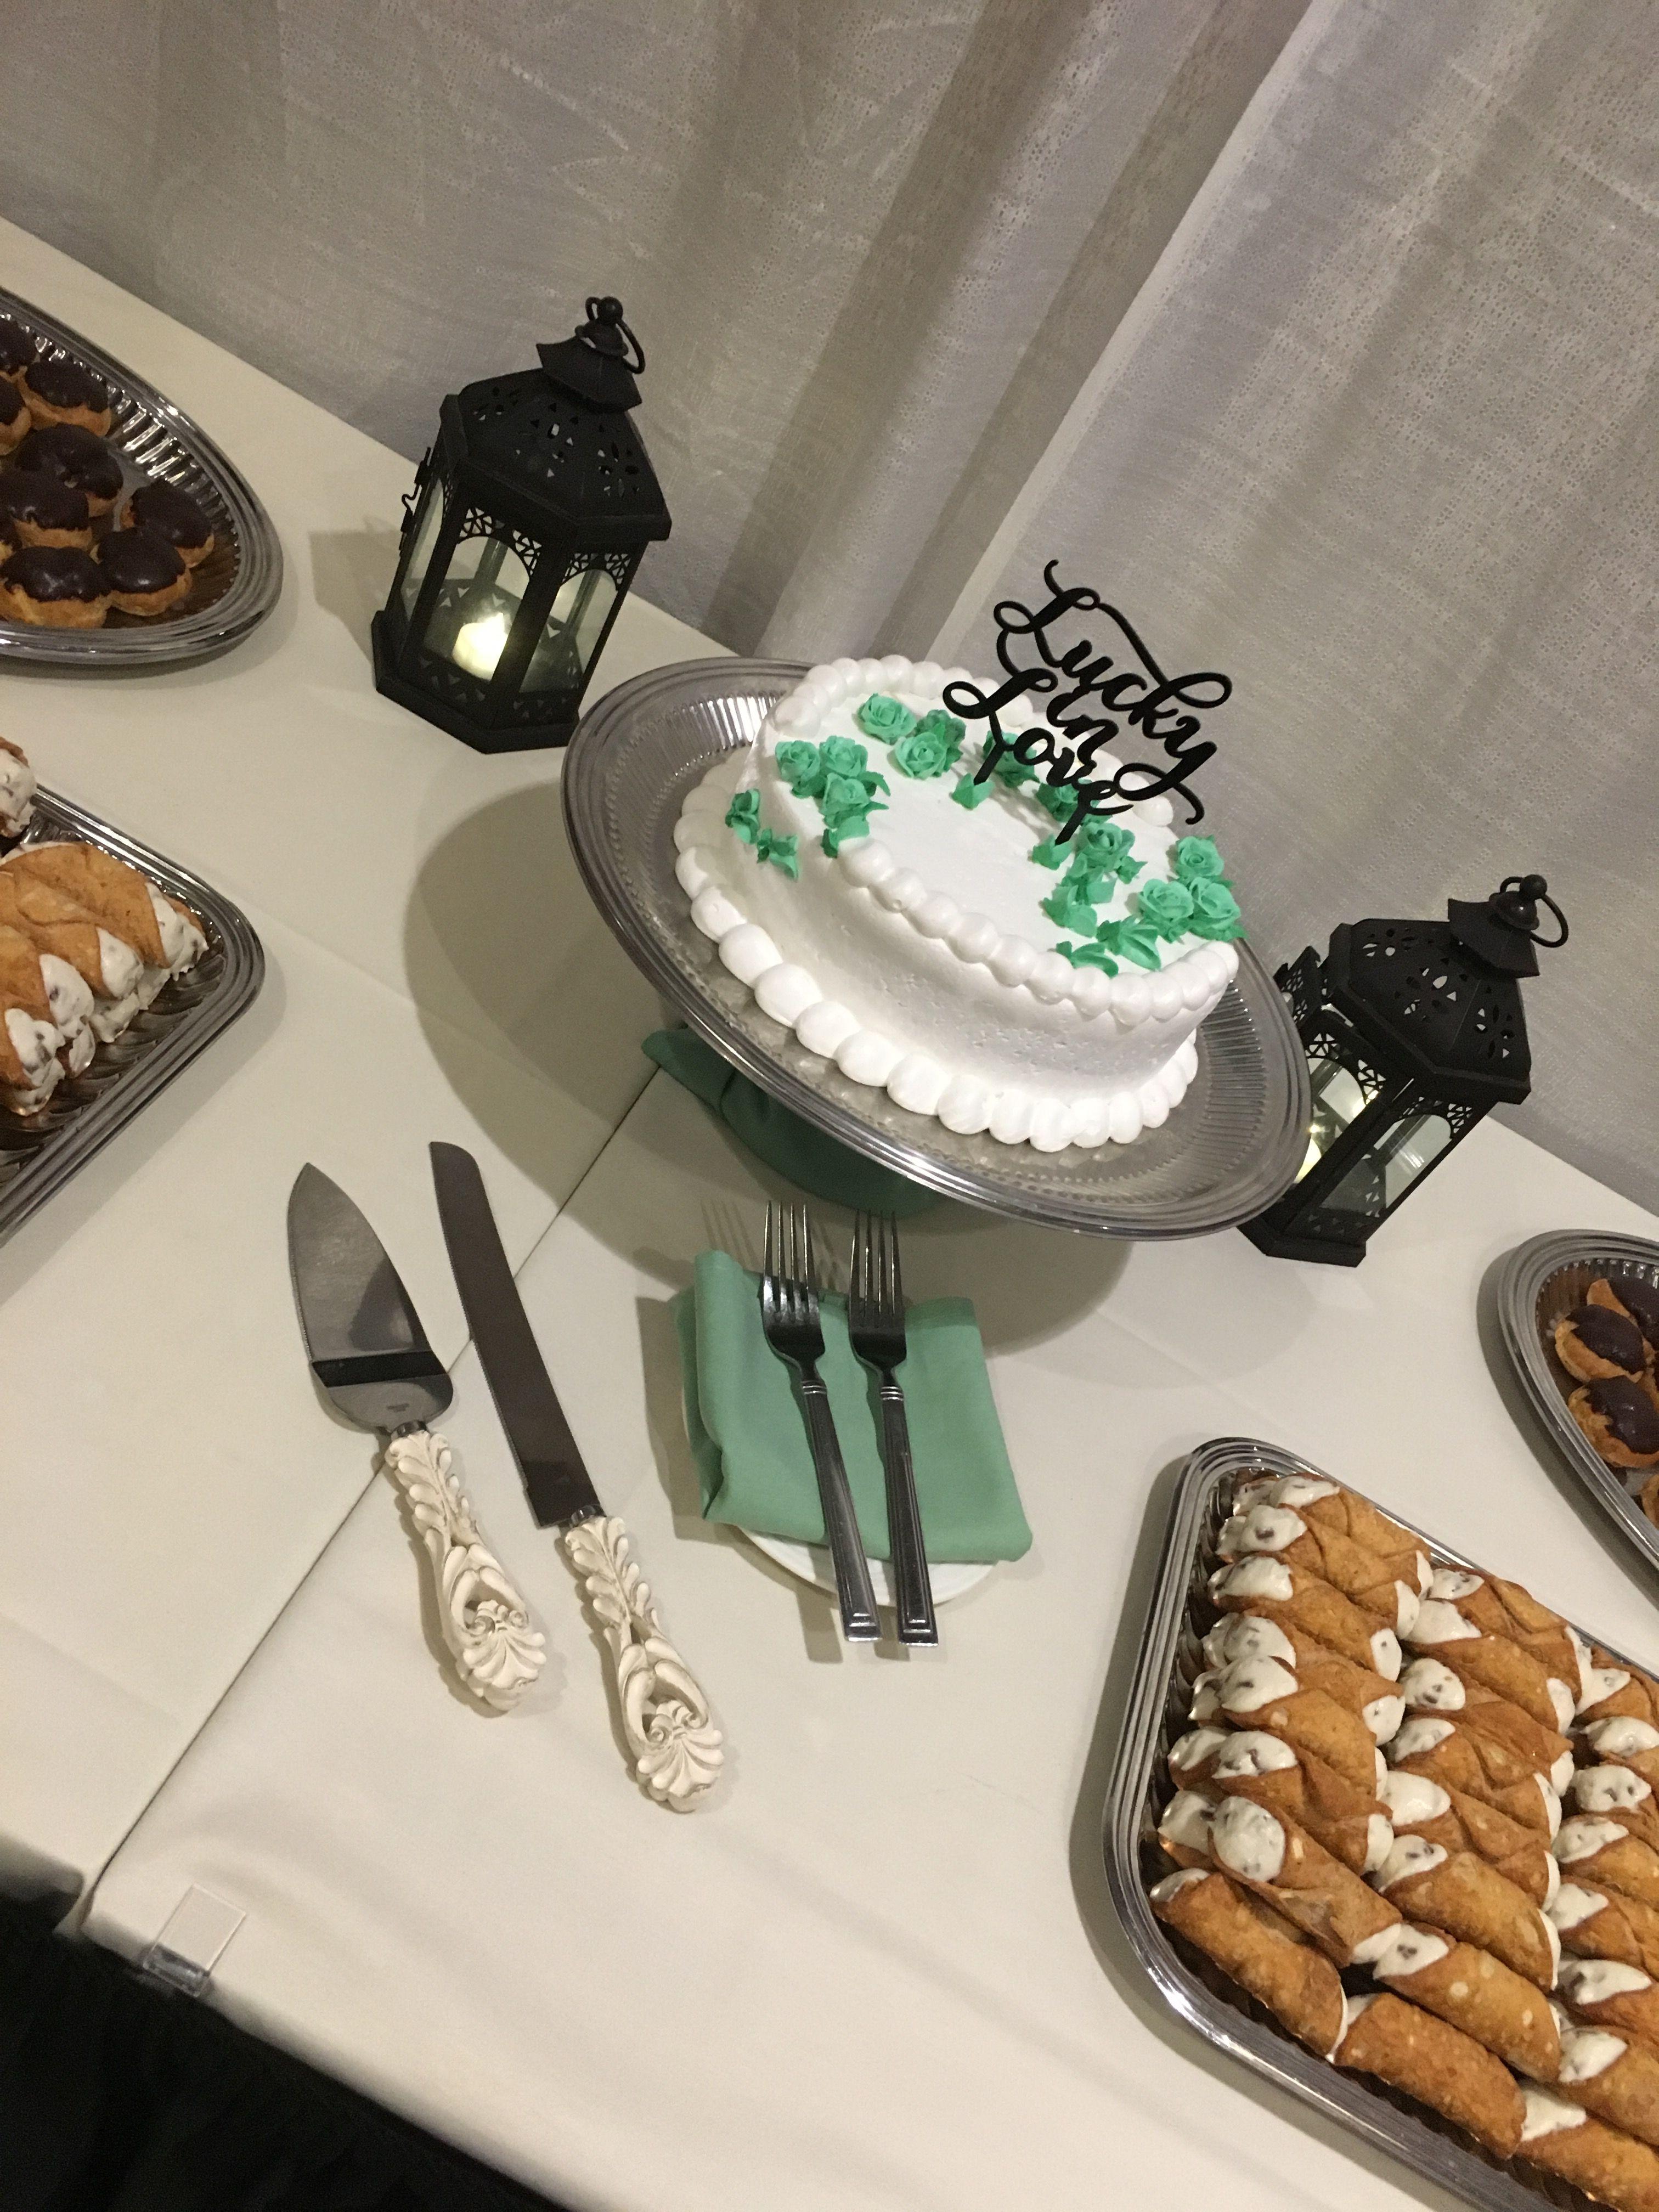 Vernondownsweddings Cutcake